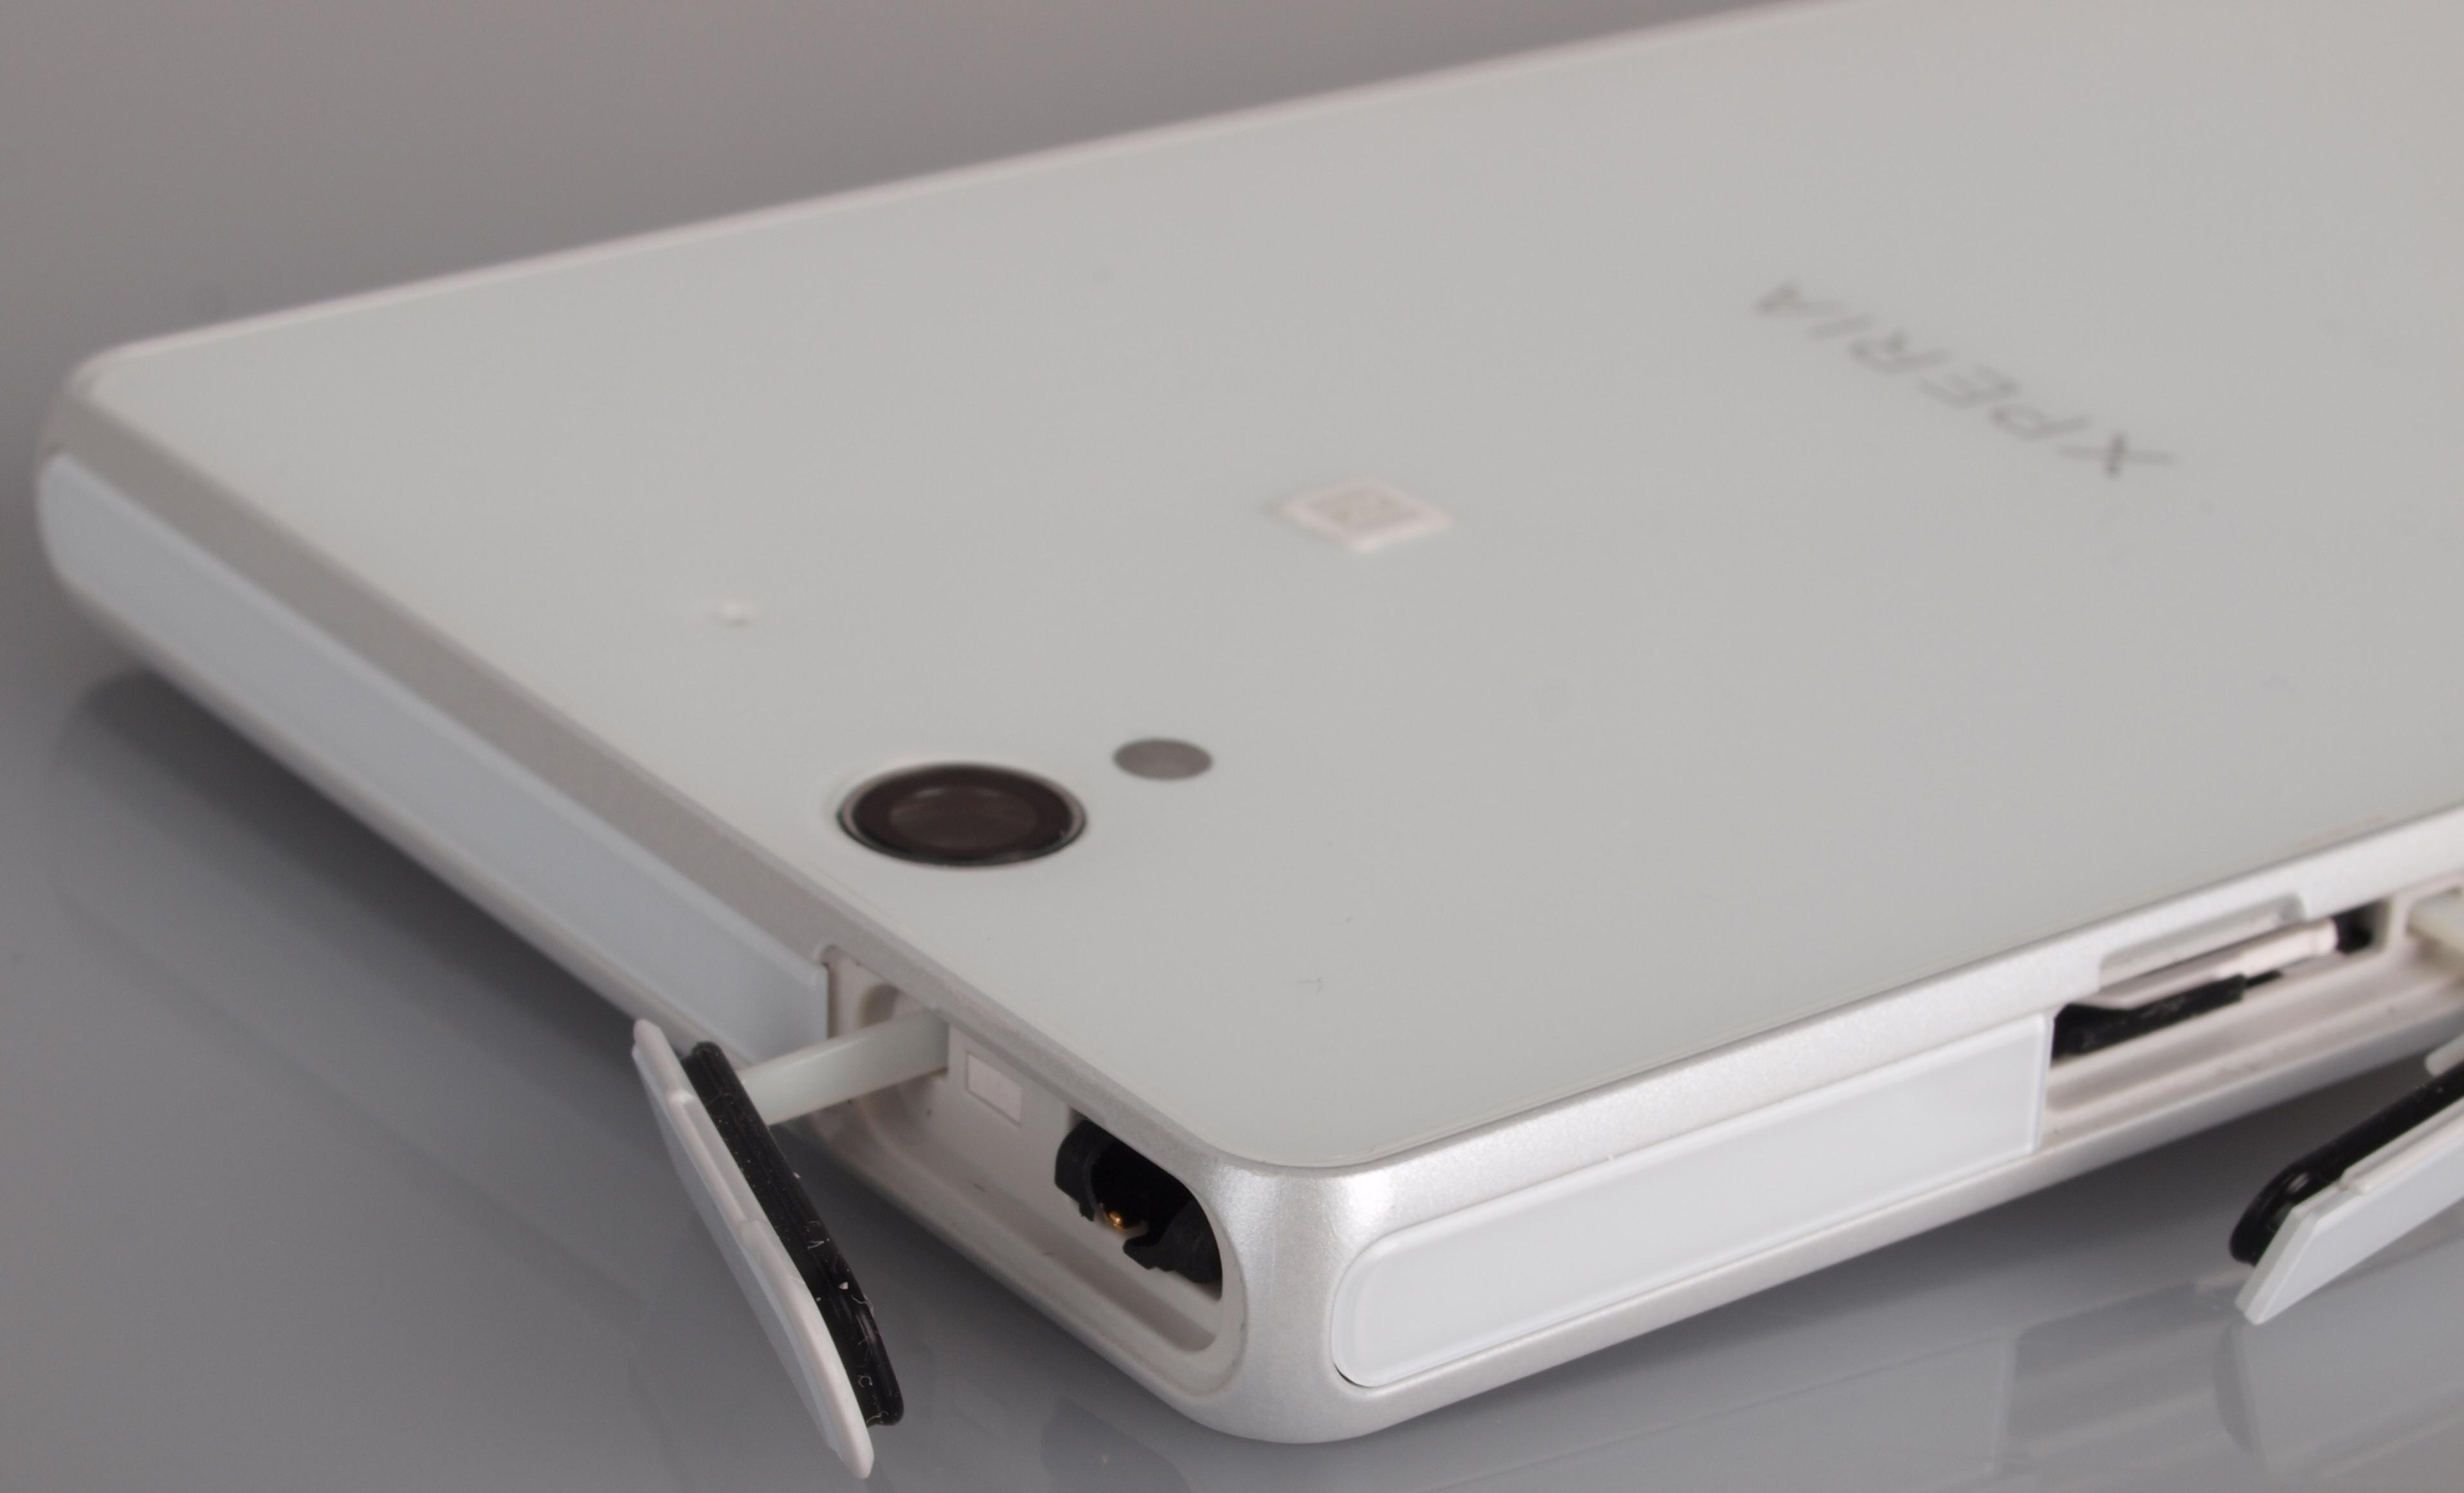 Sony Xperia Z Camera Phone Review